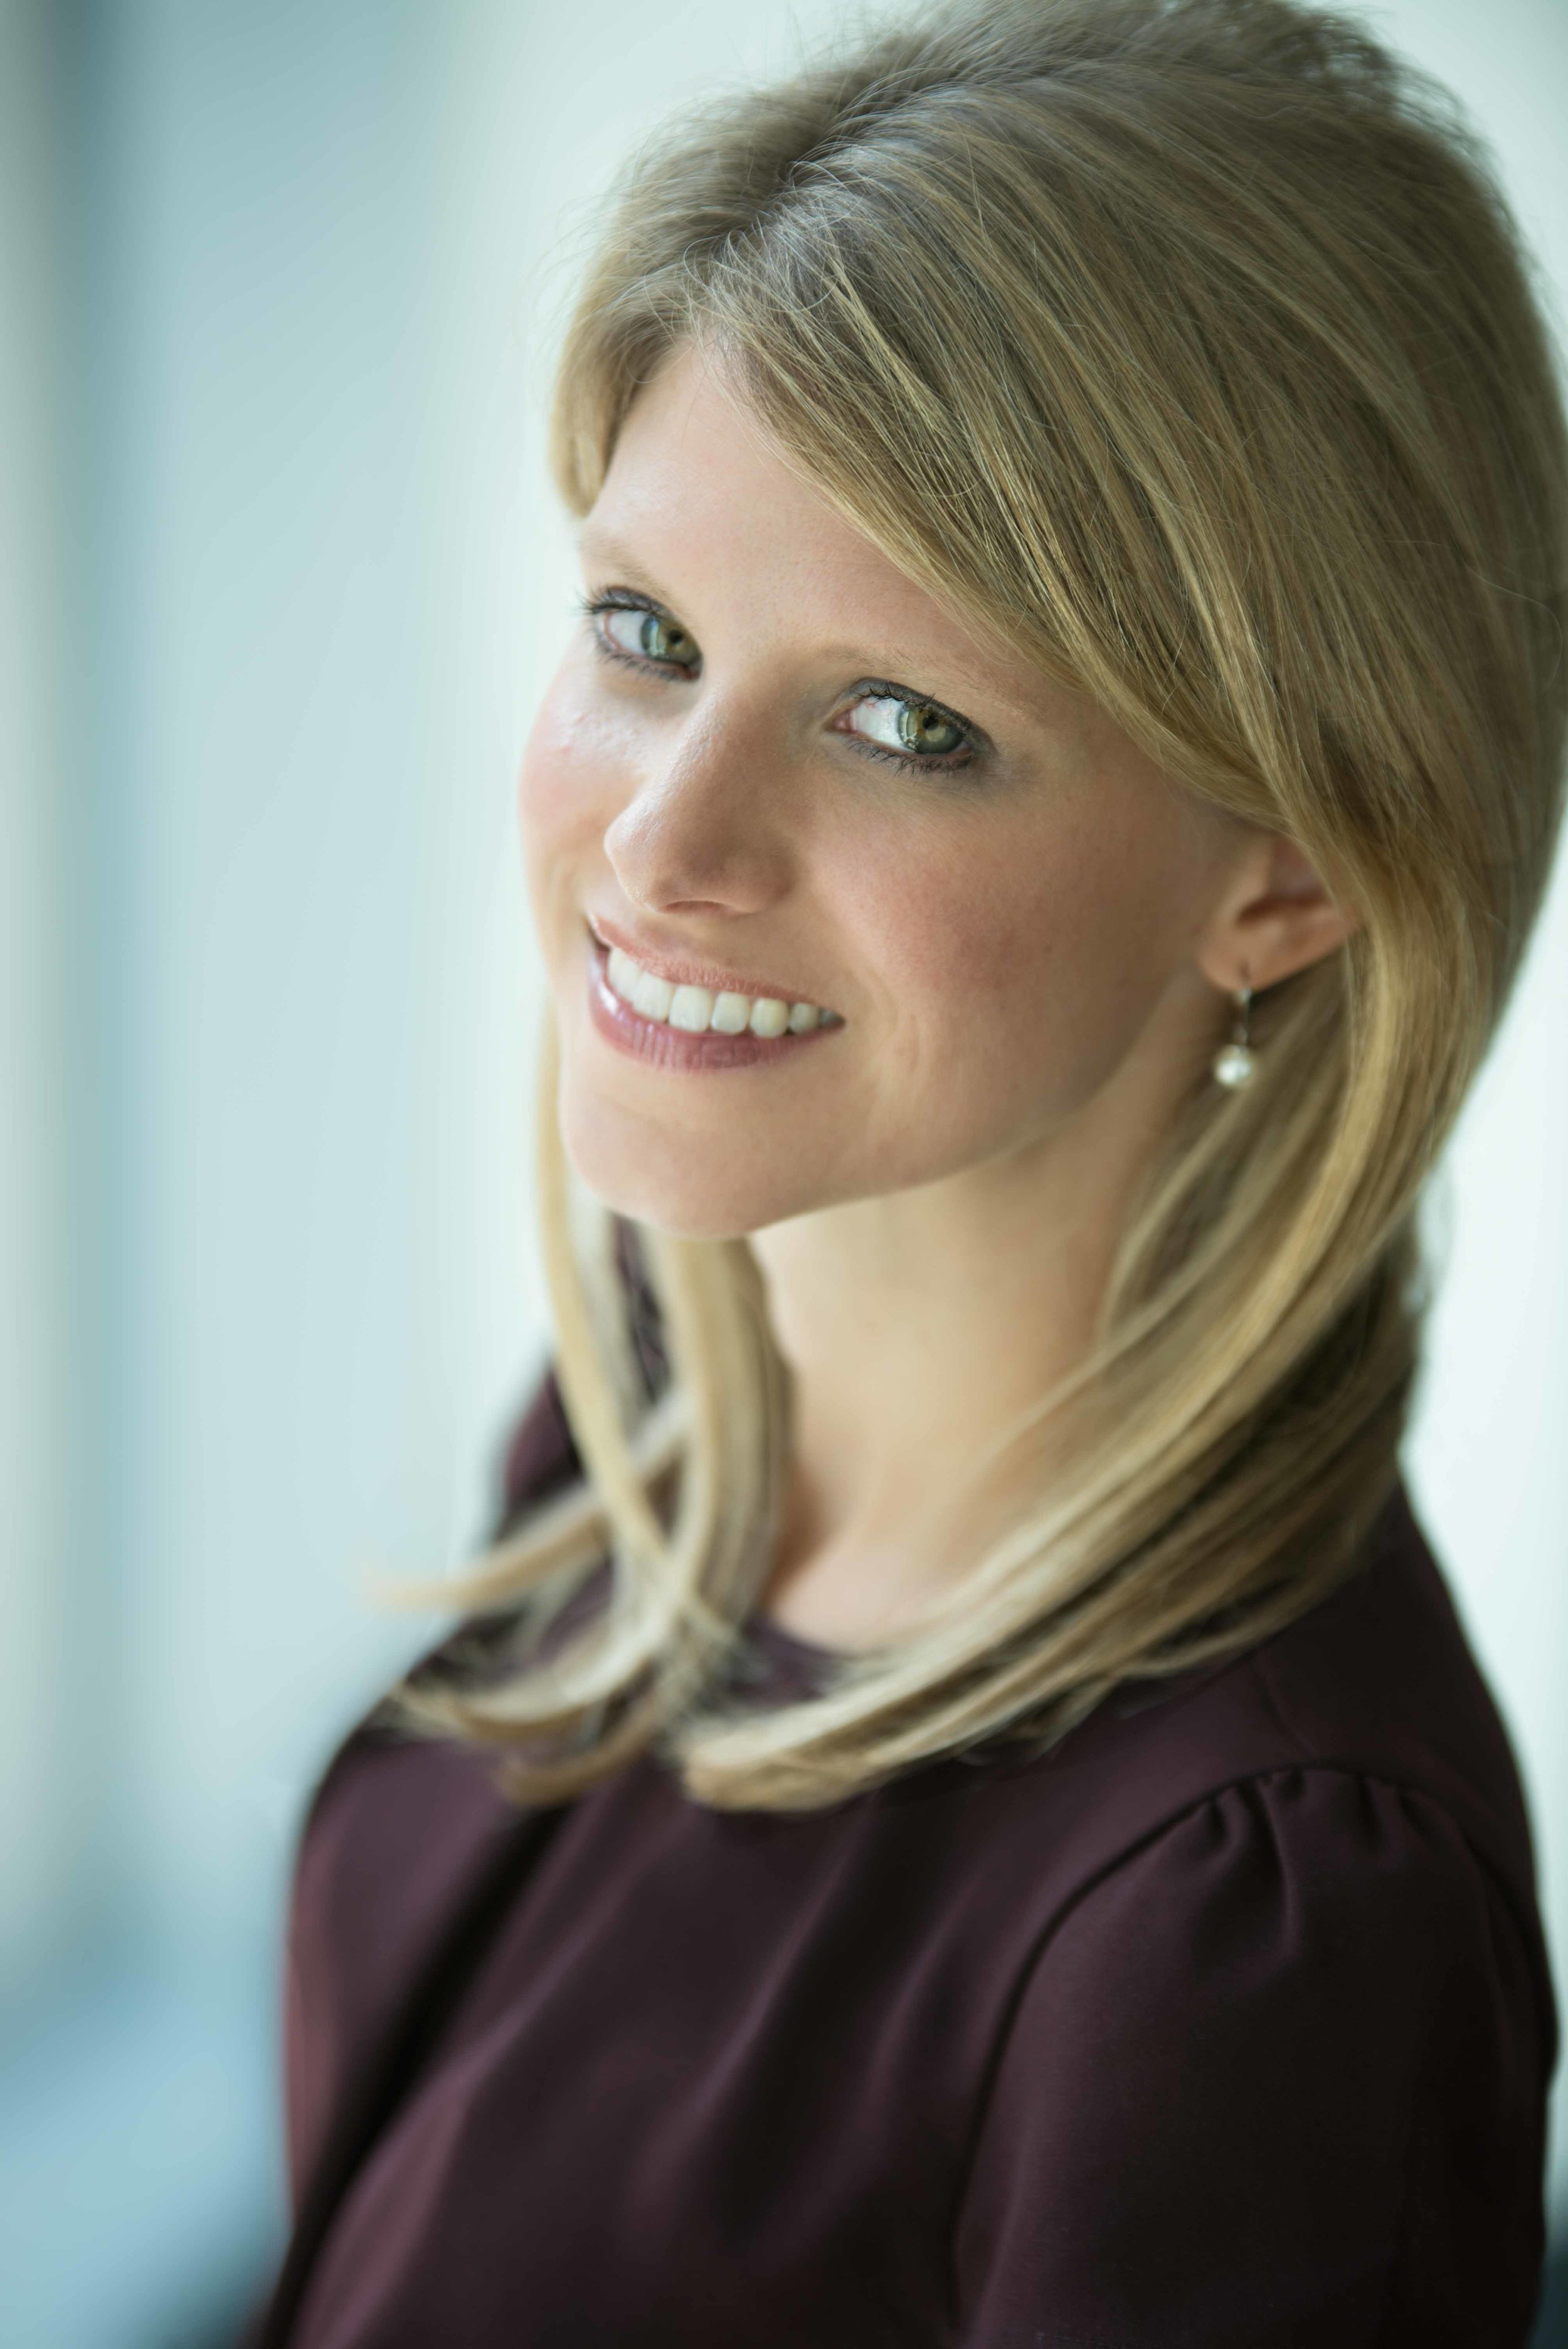 London & Brighton Professional Portrait photographer- Corporate Headshots and Personal Branding Portrait Session